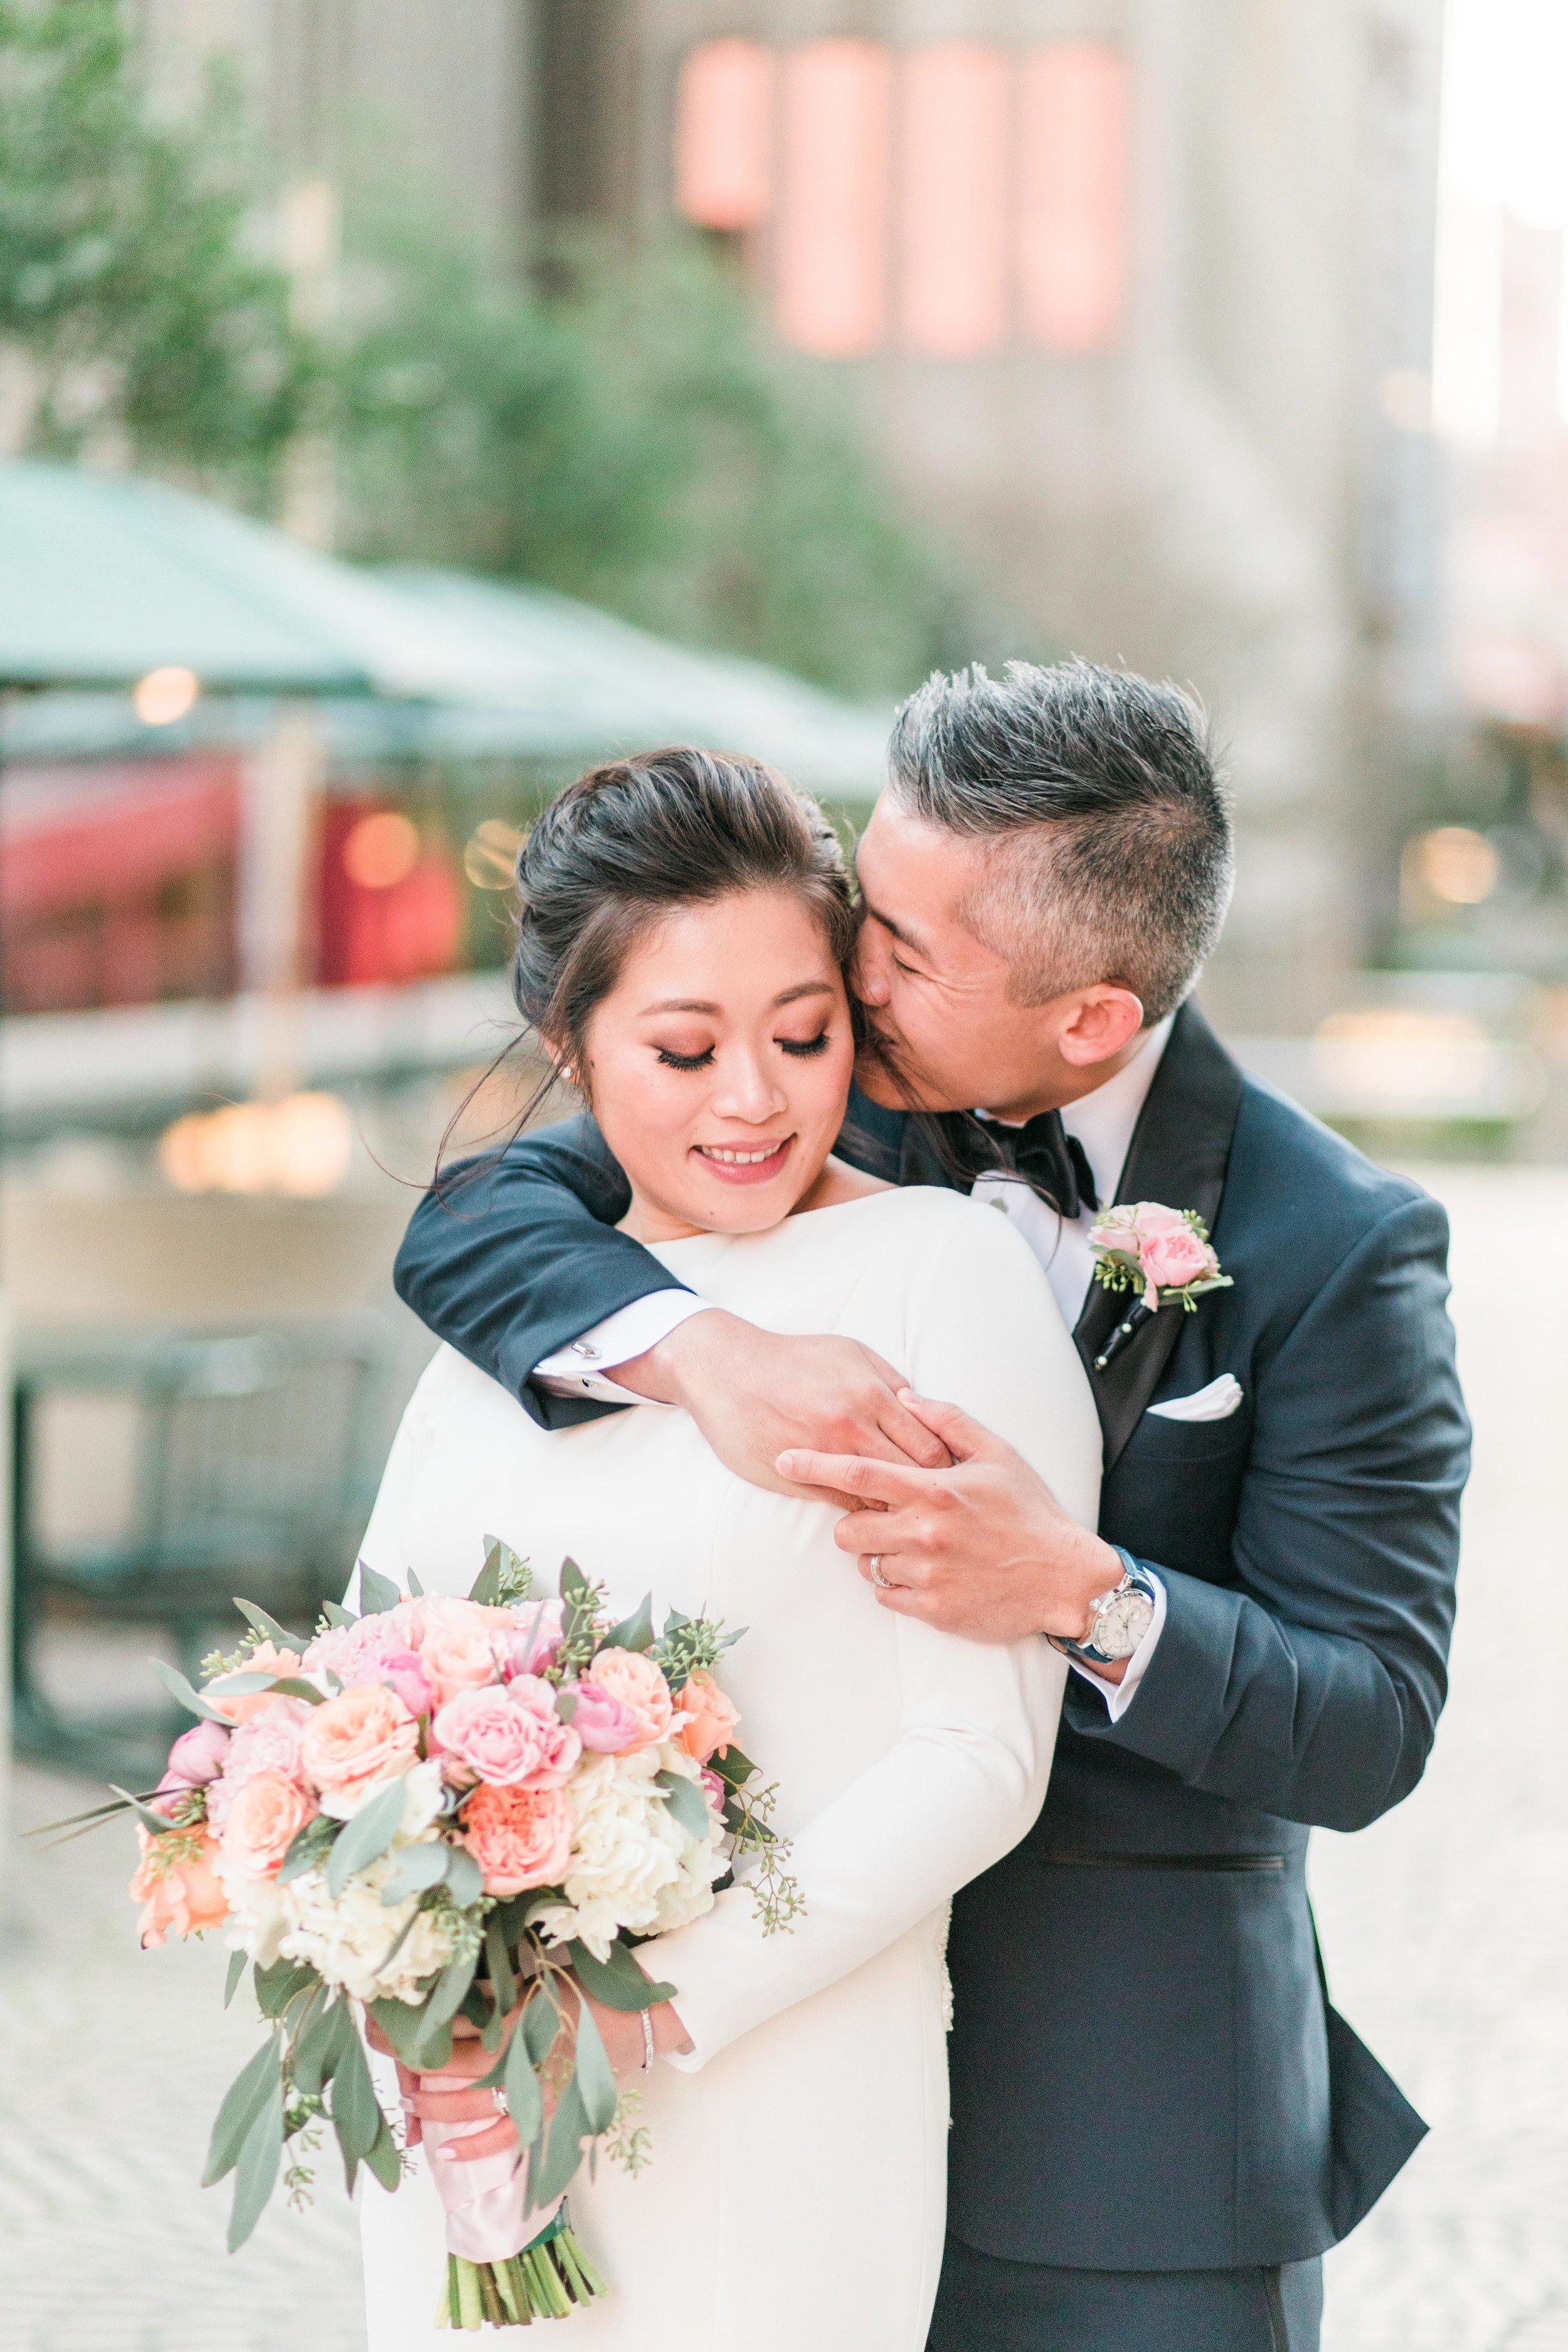 Marina-Eugene-Wedding-by-JBJ-Pictures-294.jpg